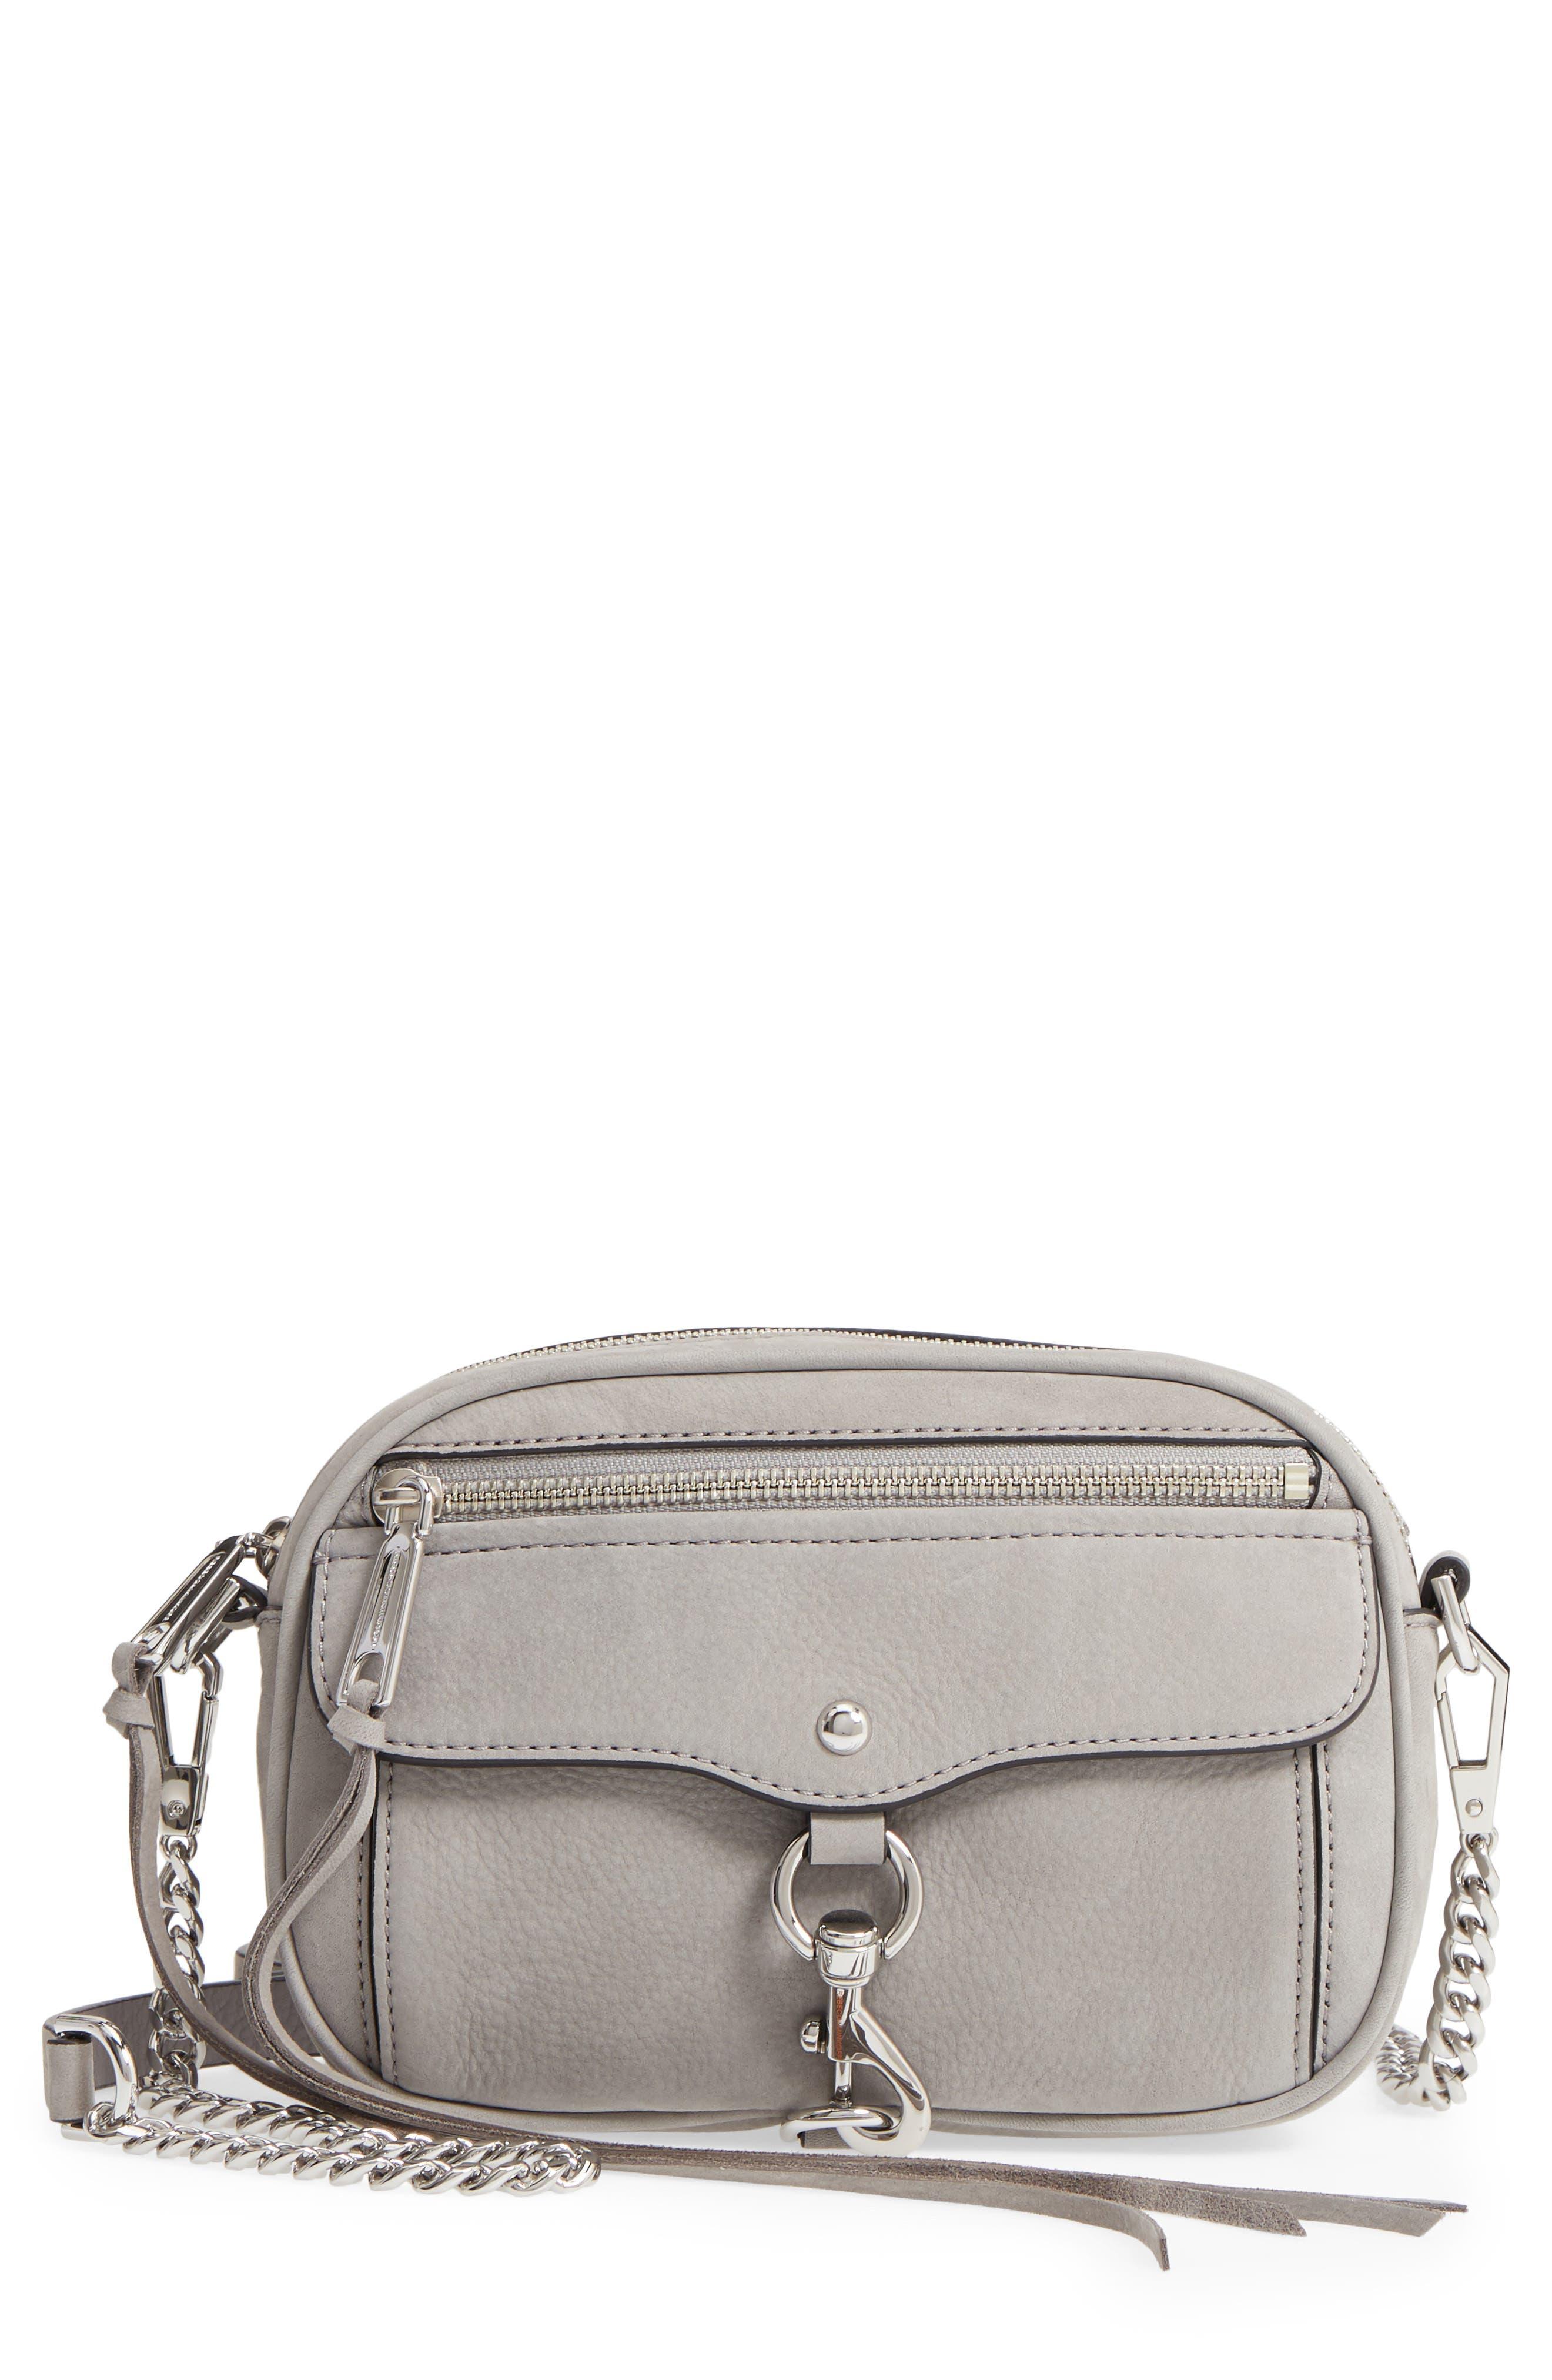 REBECCA MINKOFF Blythe Leather Crossbody Bag, Main, color, 020